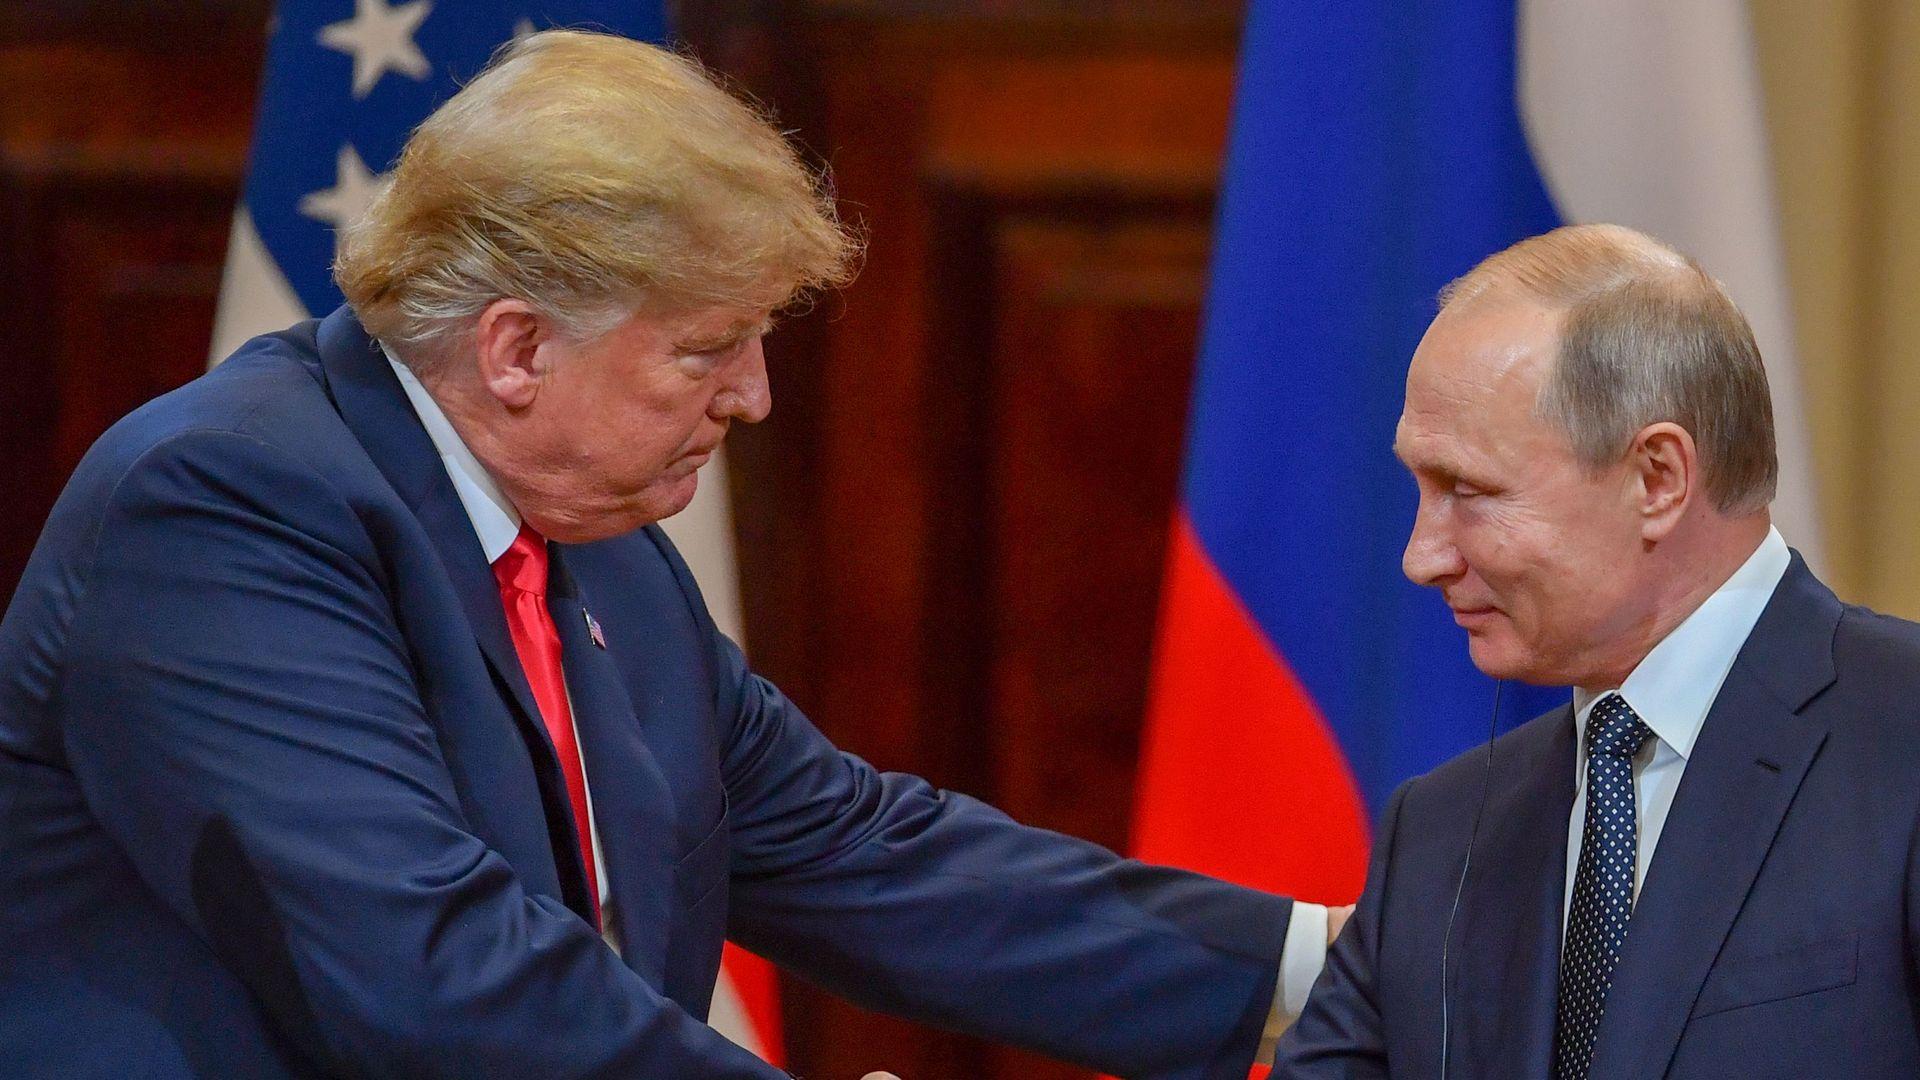 Trump shaking hands with Putin